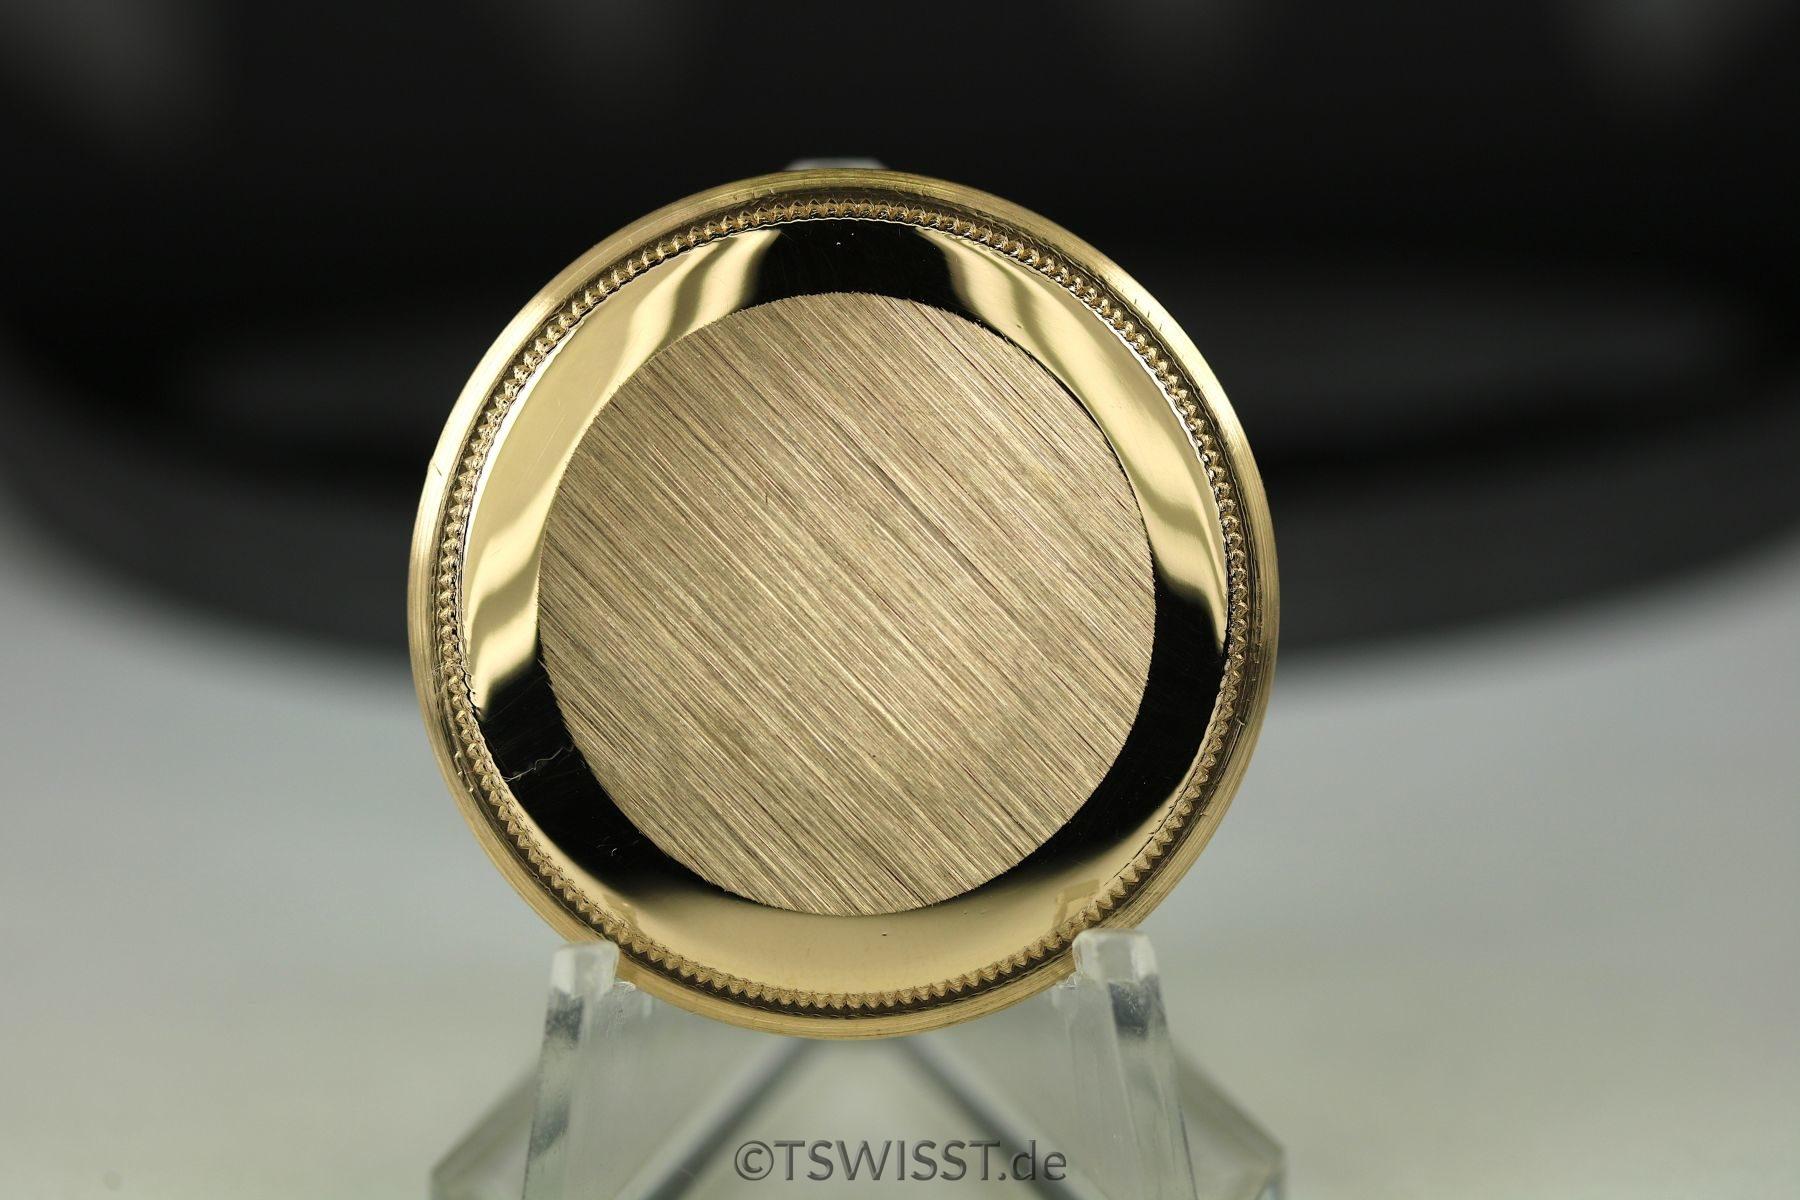 Rolex Datejust 16018 case back